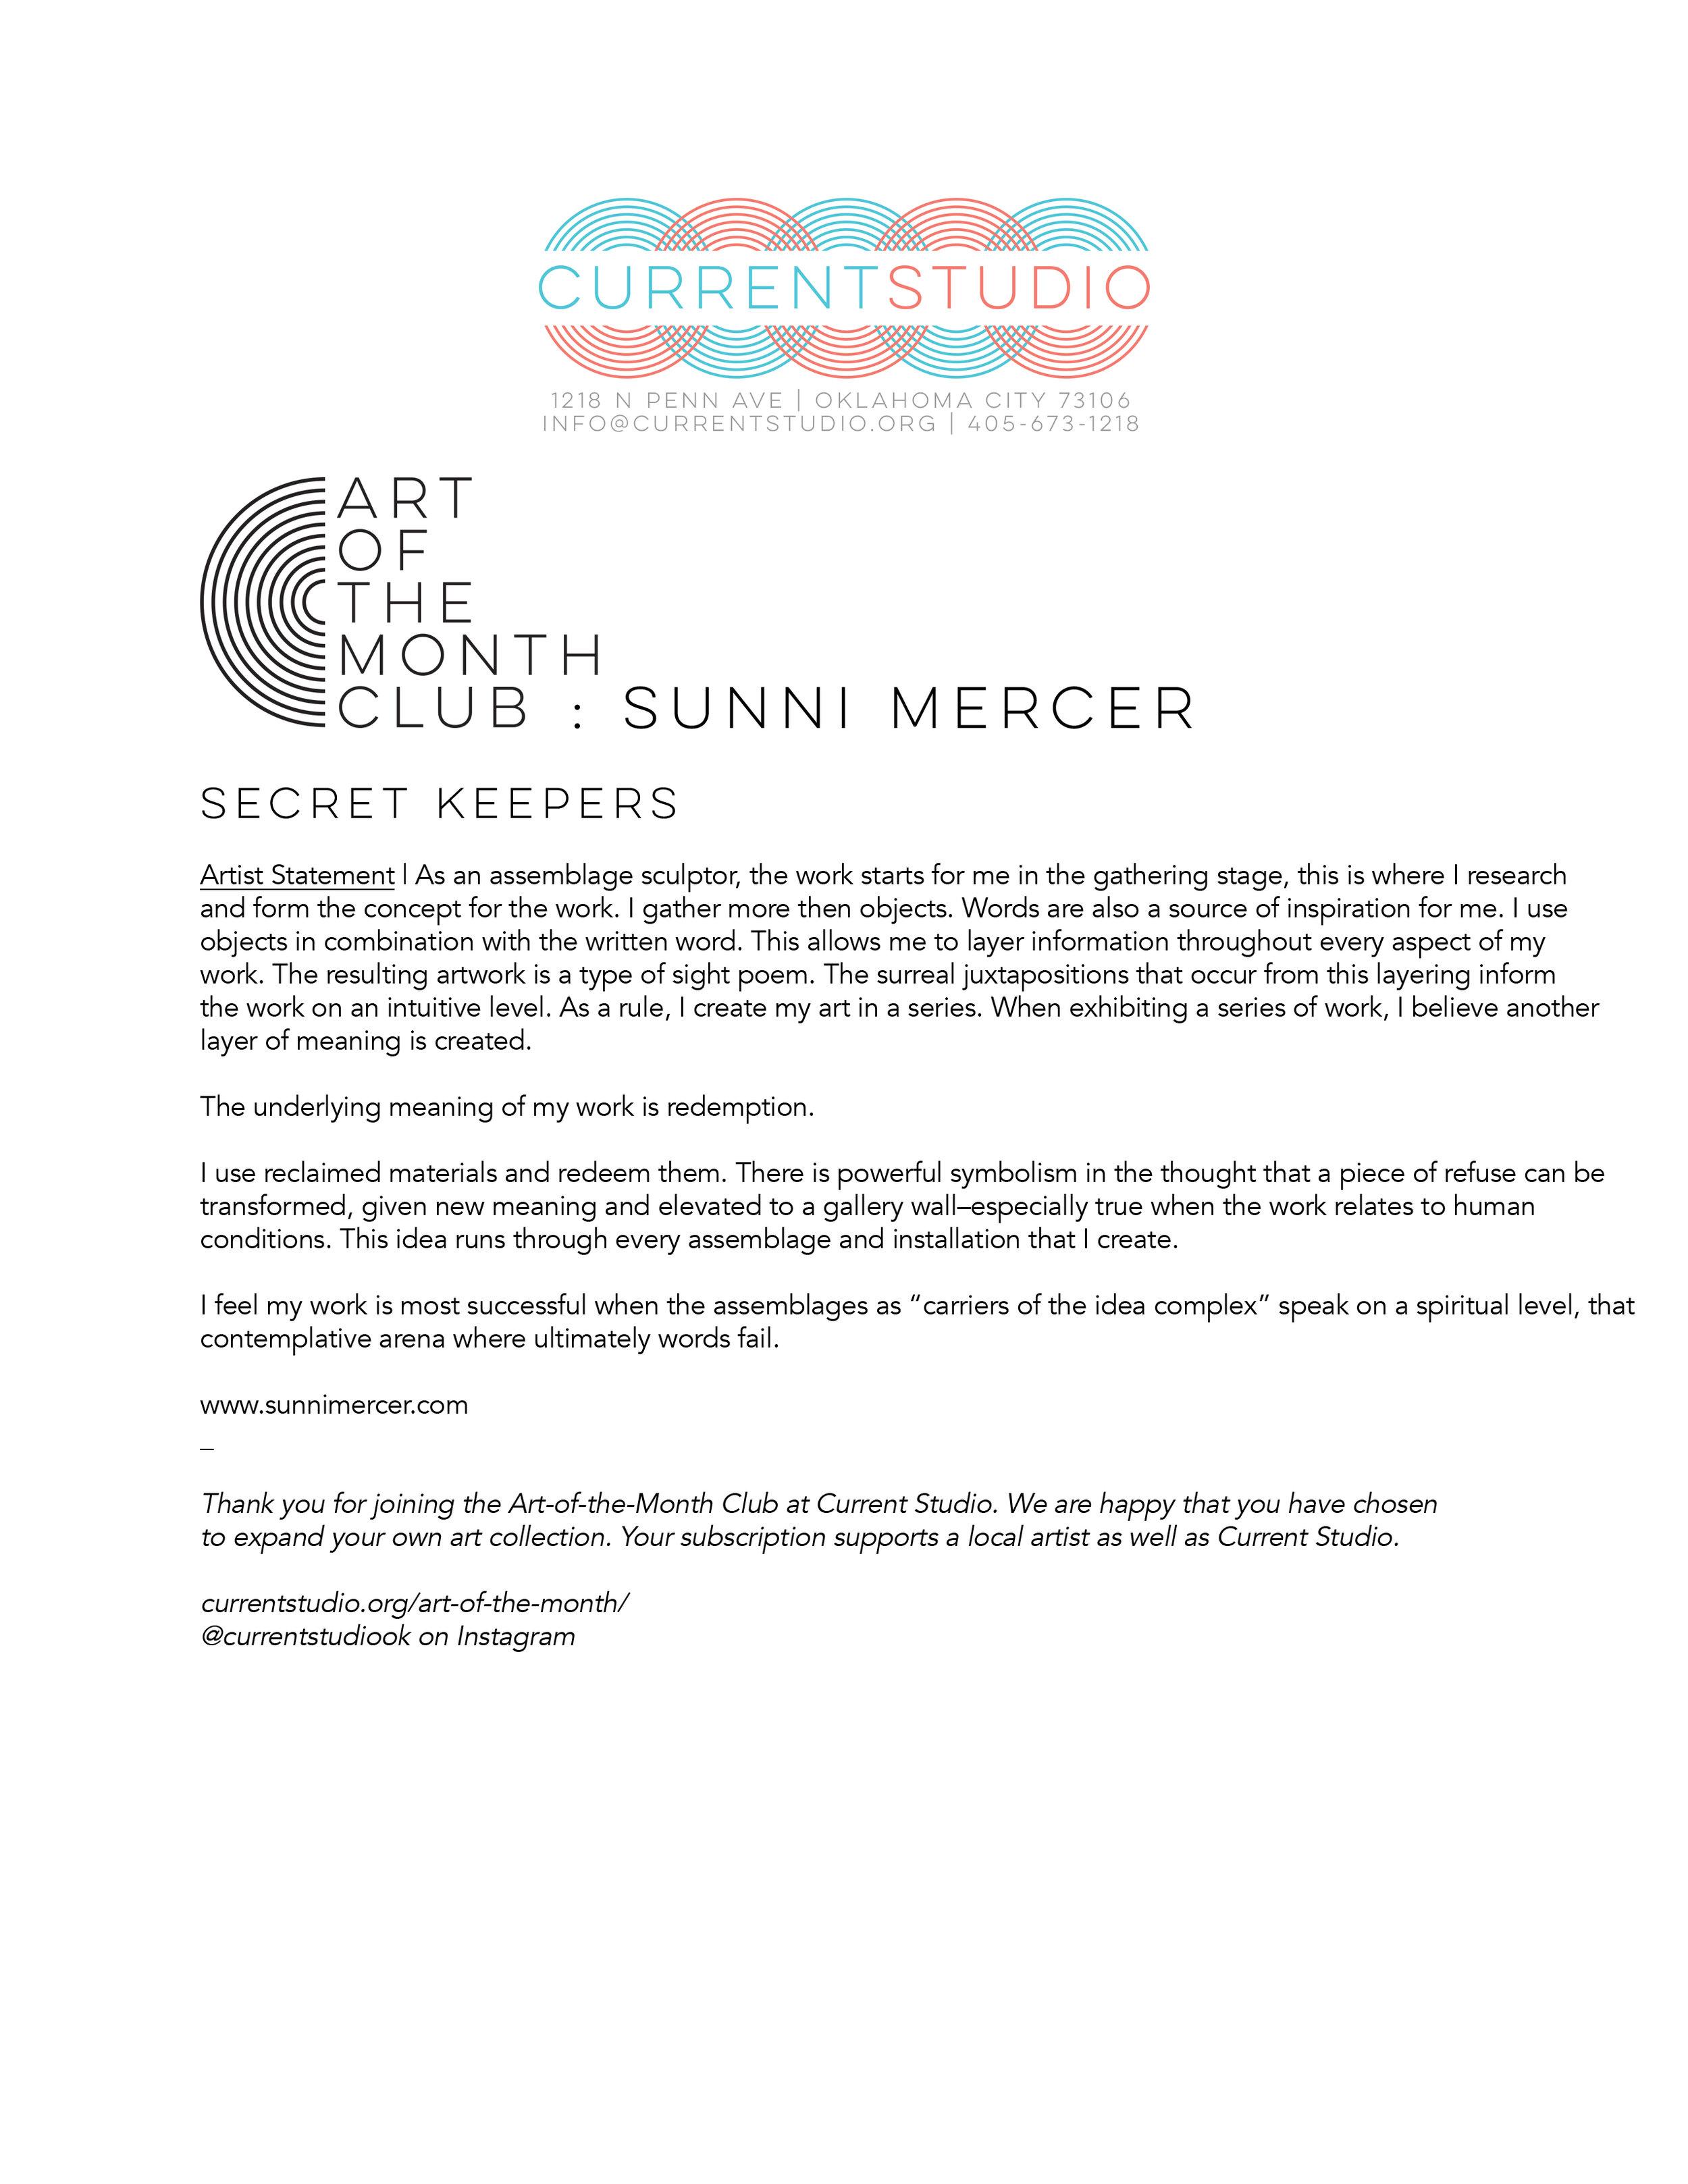 art of the month artist sheet - sunni mercer.jpg